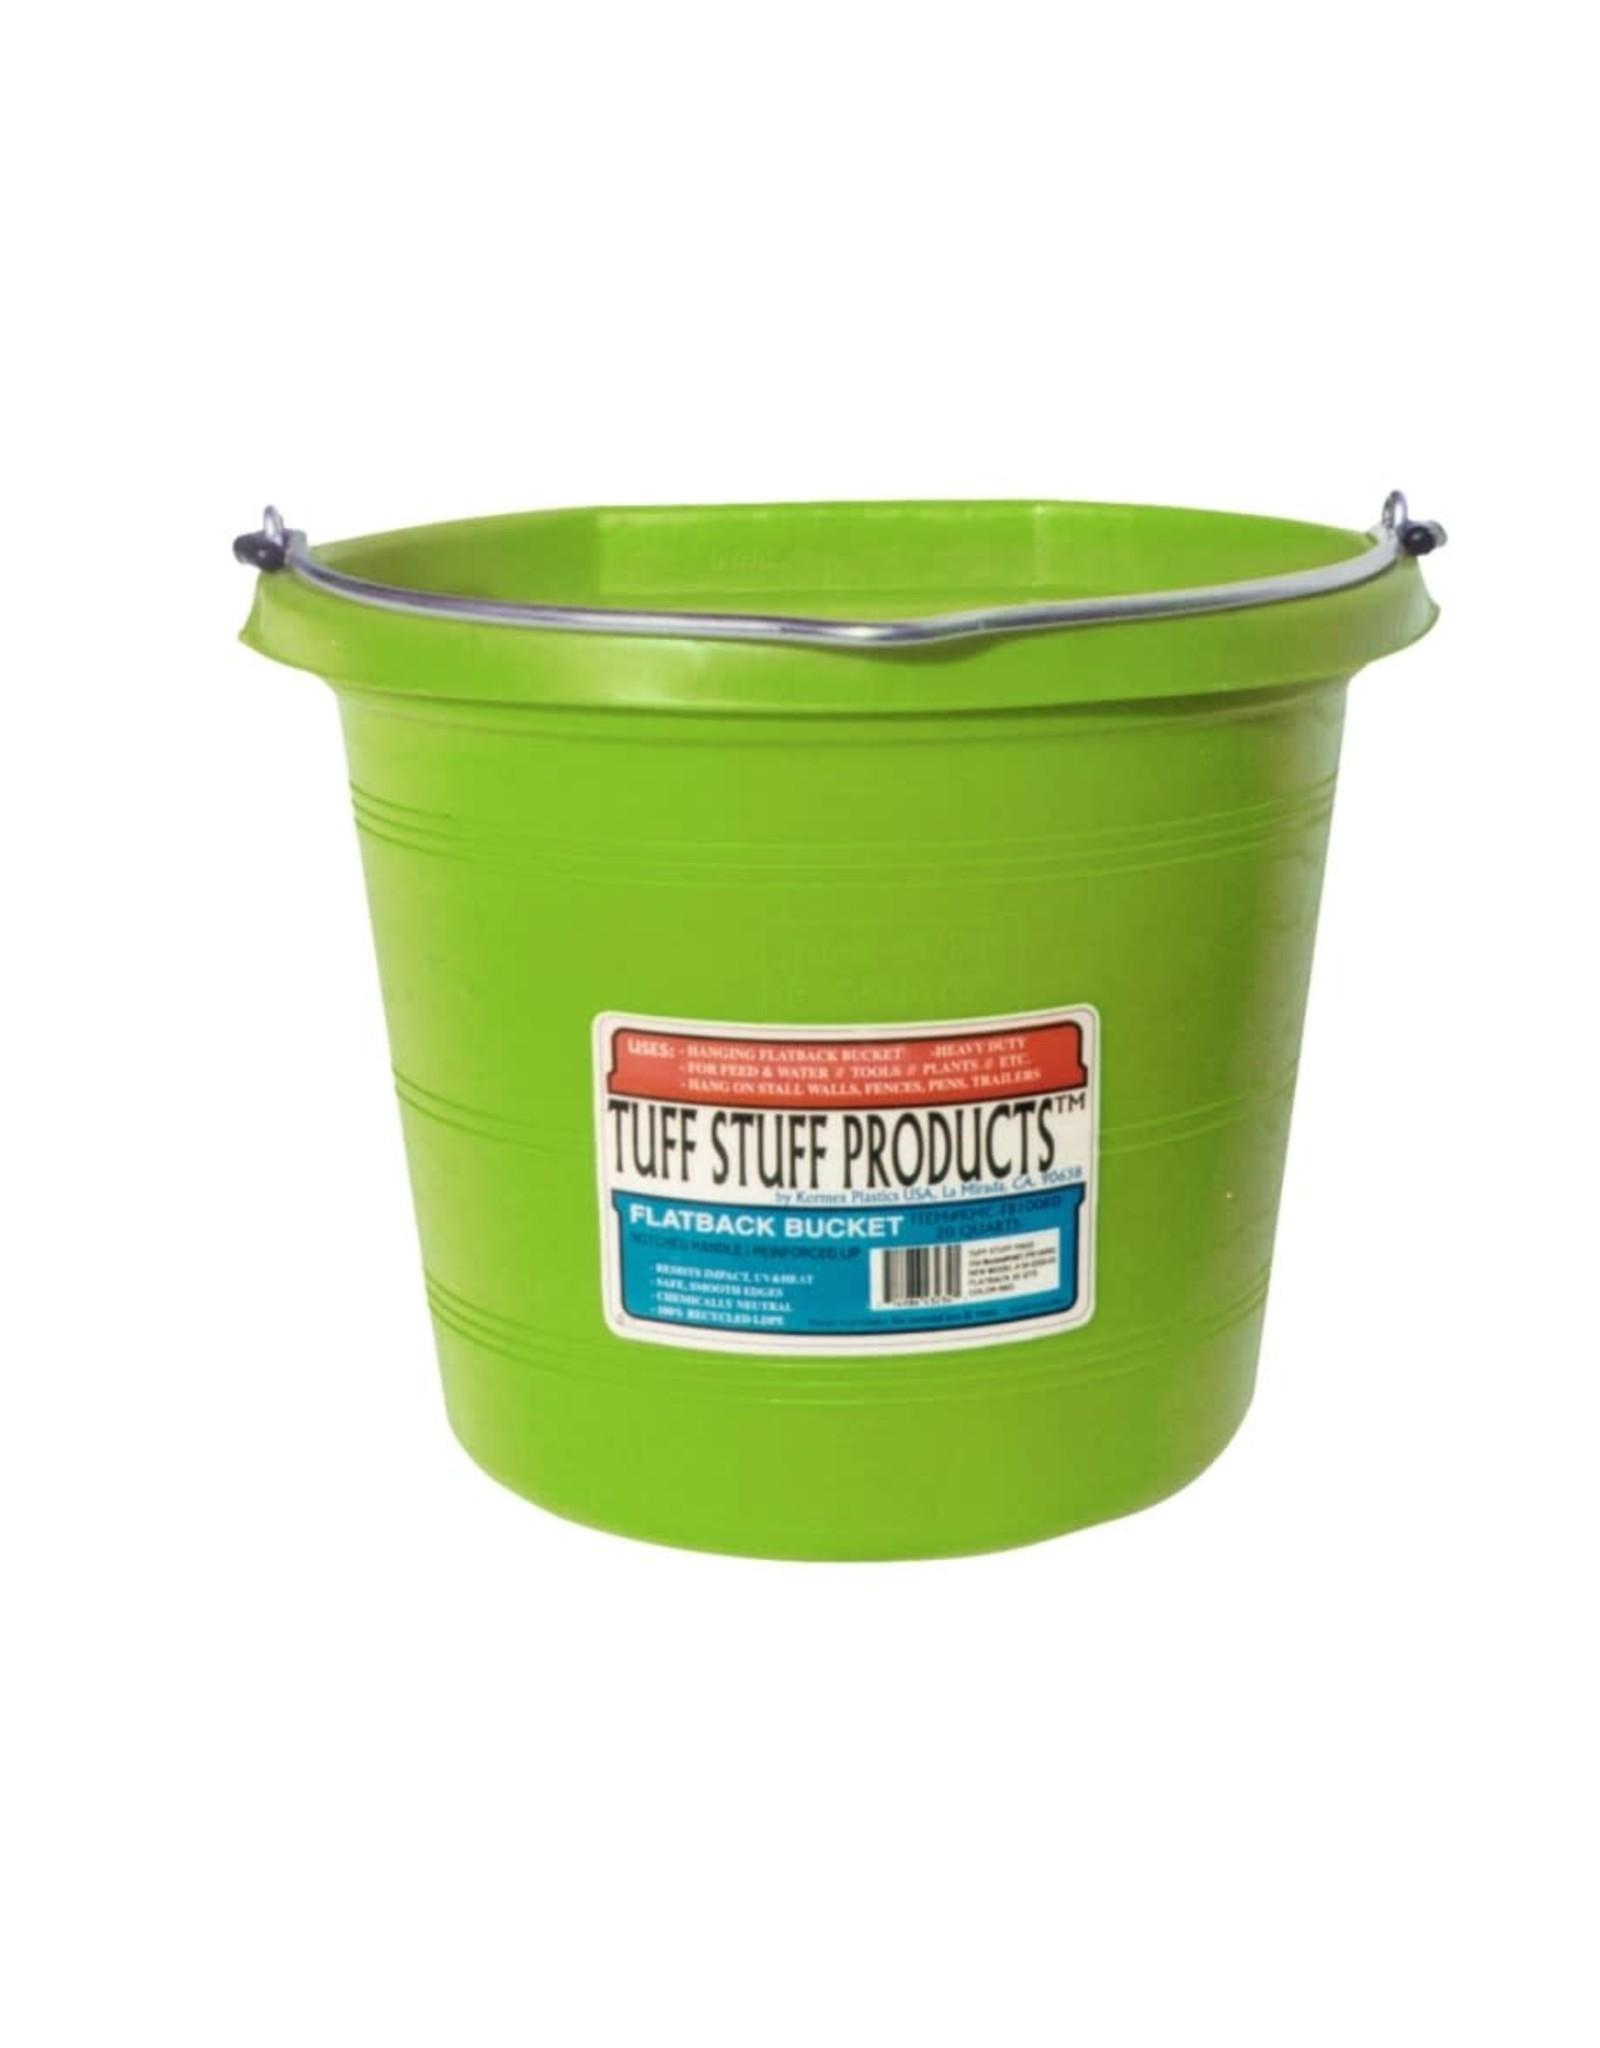 Tuff Stuff Plastic Flatback Bucket